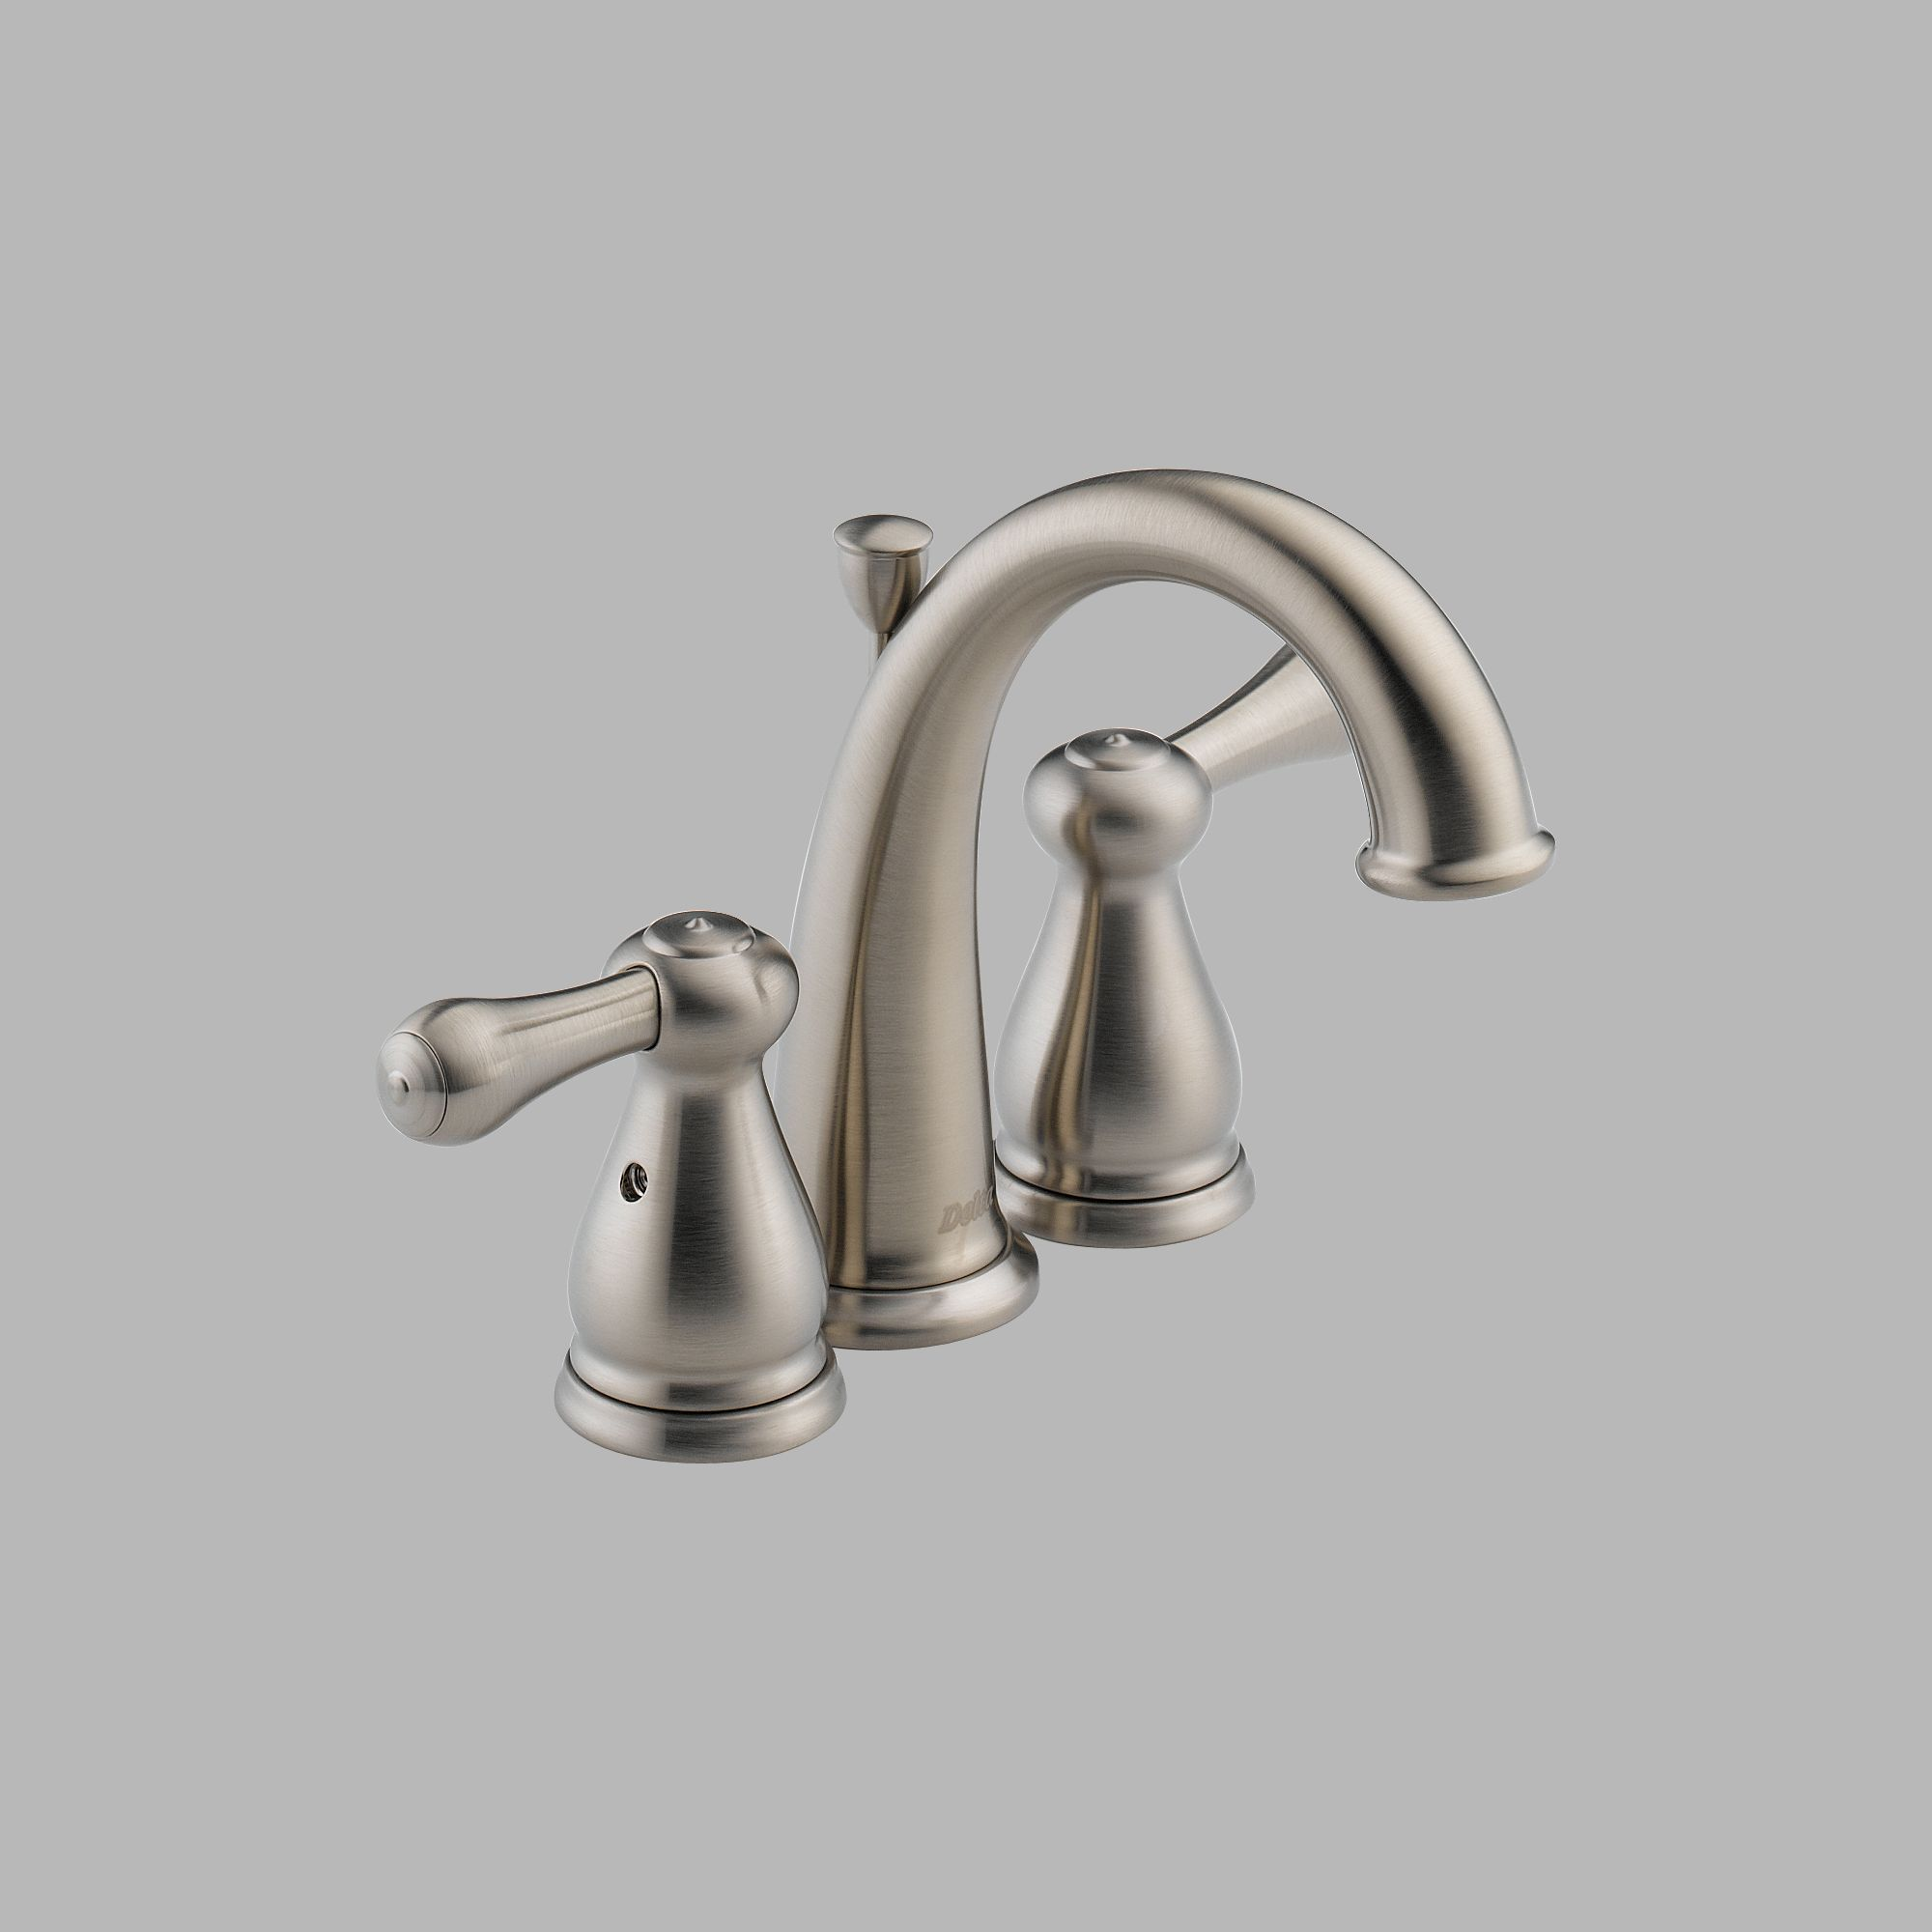 delta leland two handle mini widespread lavatory faucet frtyu